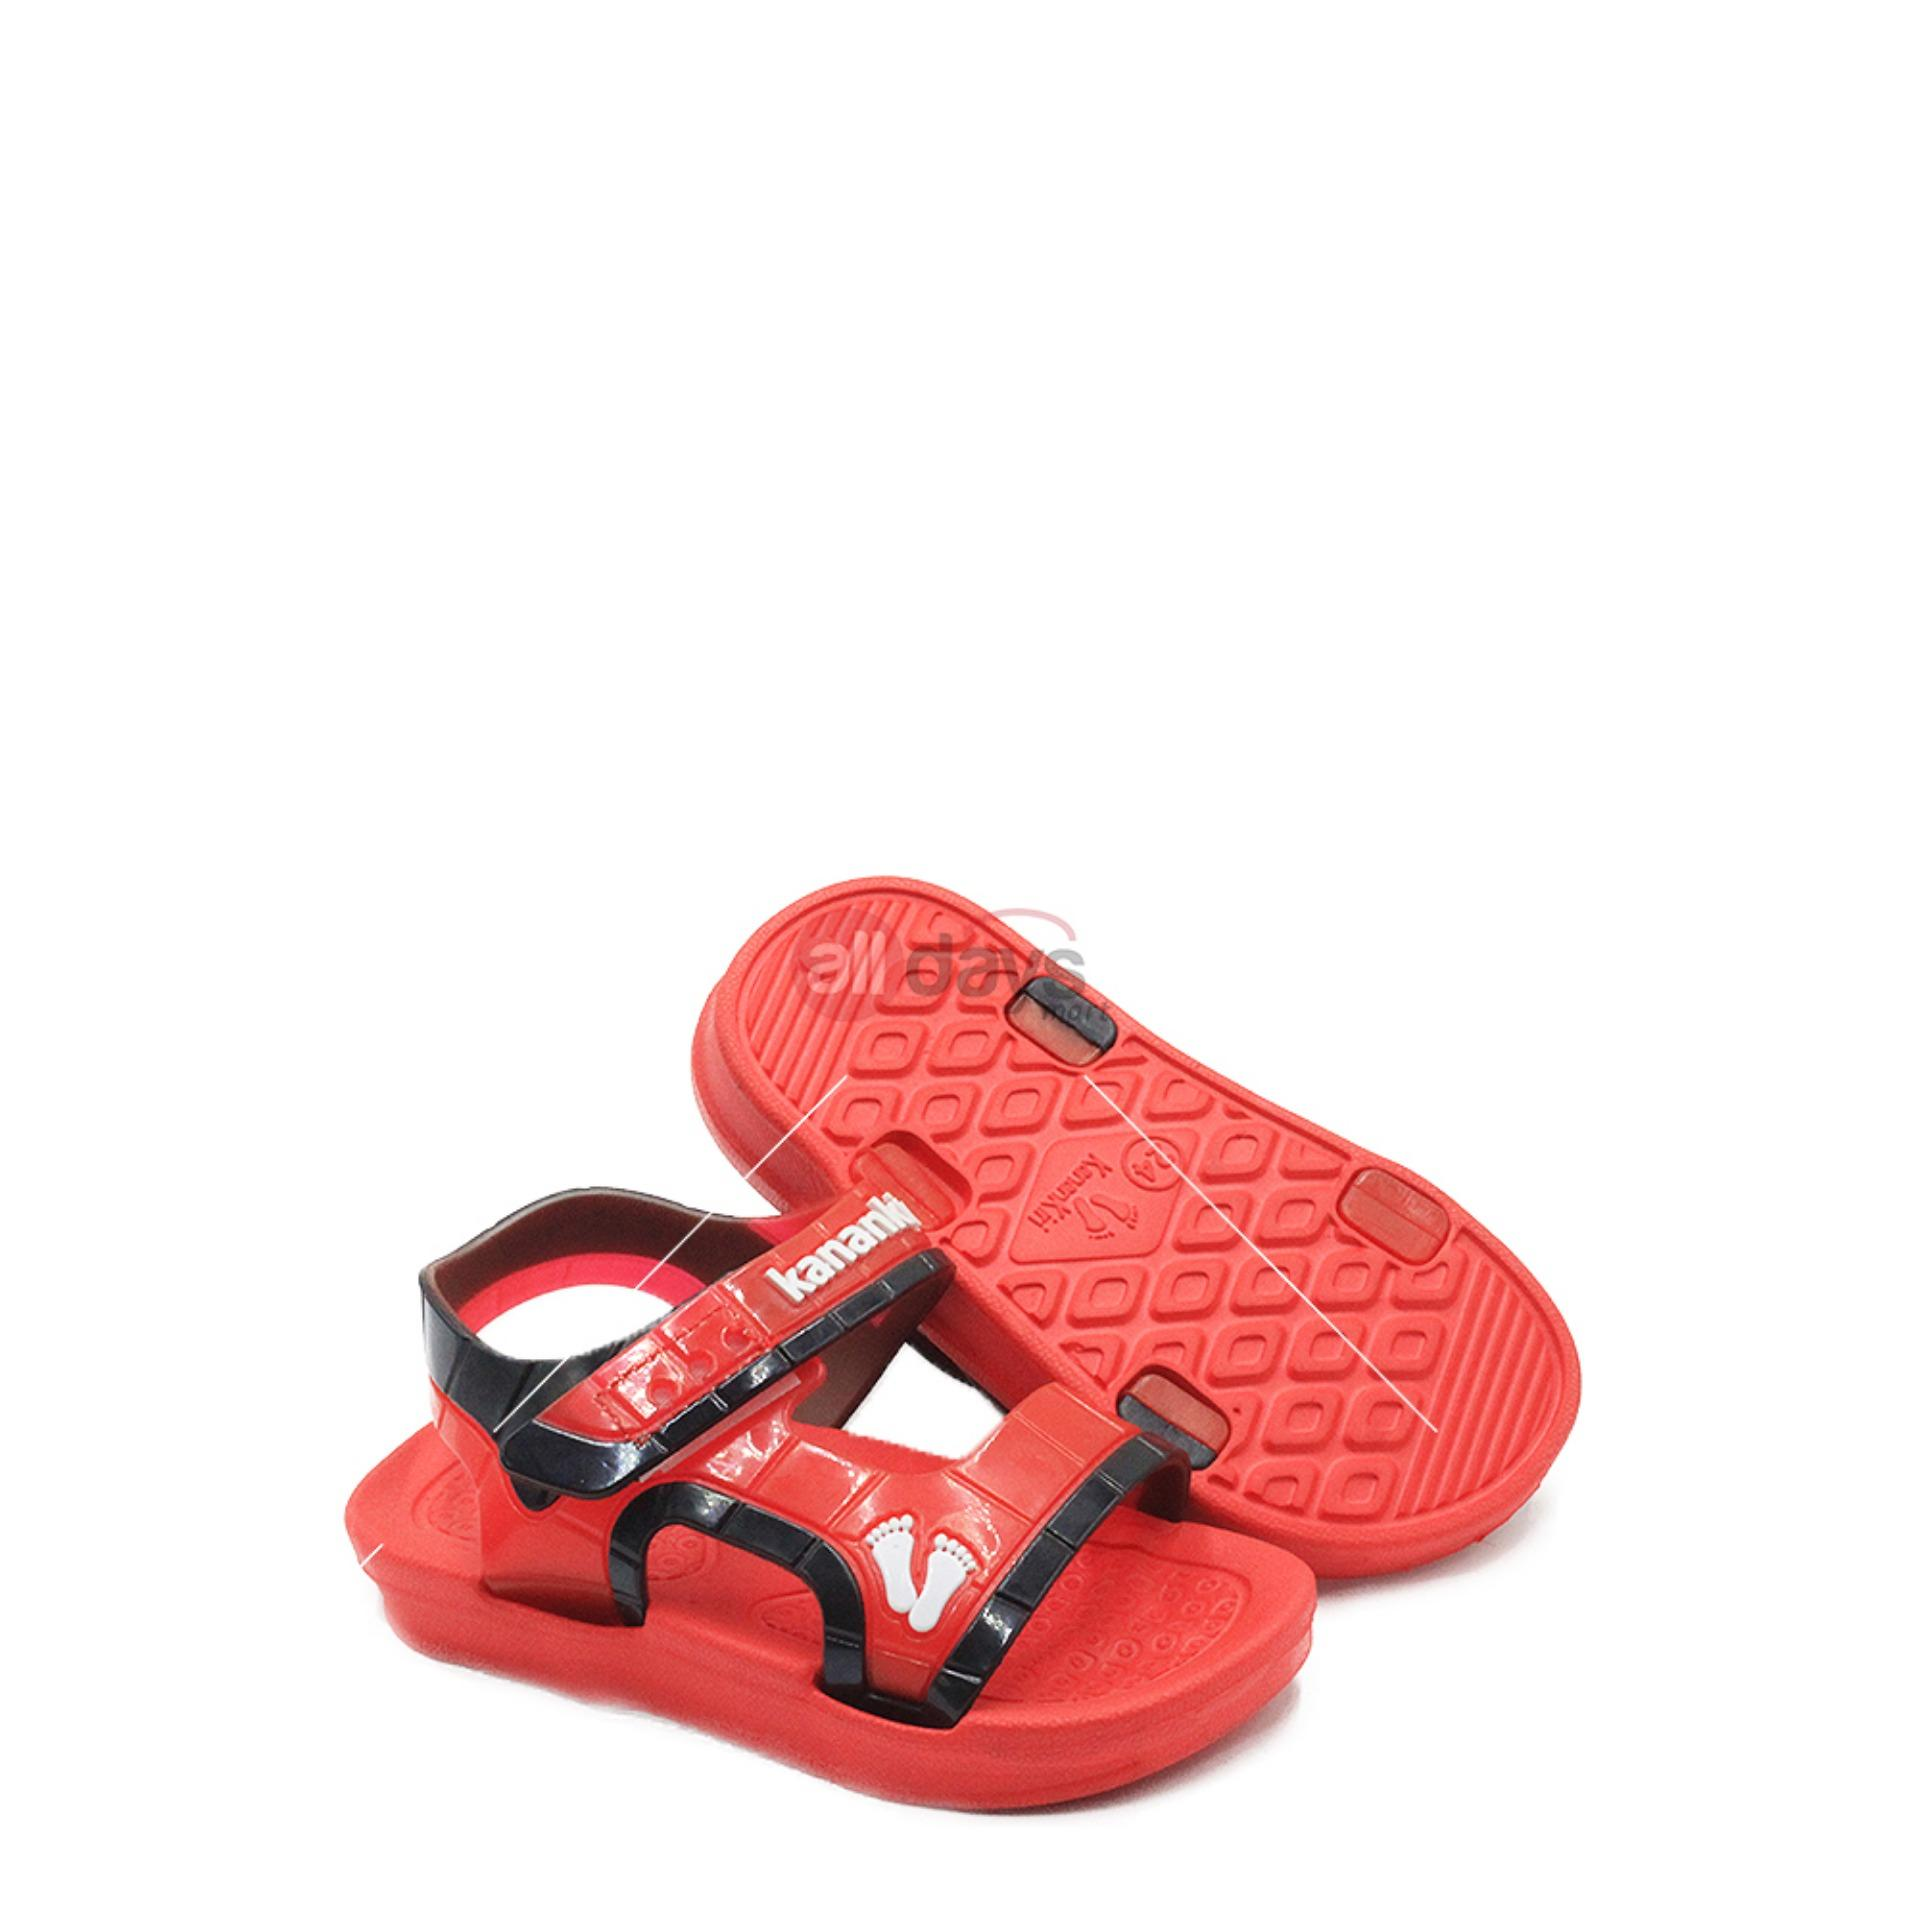 Kehebatan Kanan Kiri Sandal Selop Anak Laki K 5002 Red Dan Porto 1006 T Size 20 24 Gambar Produk Lengkap